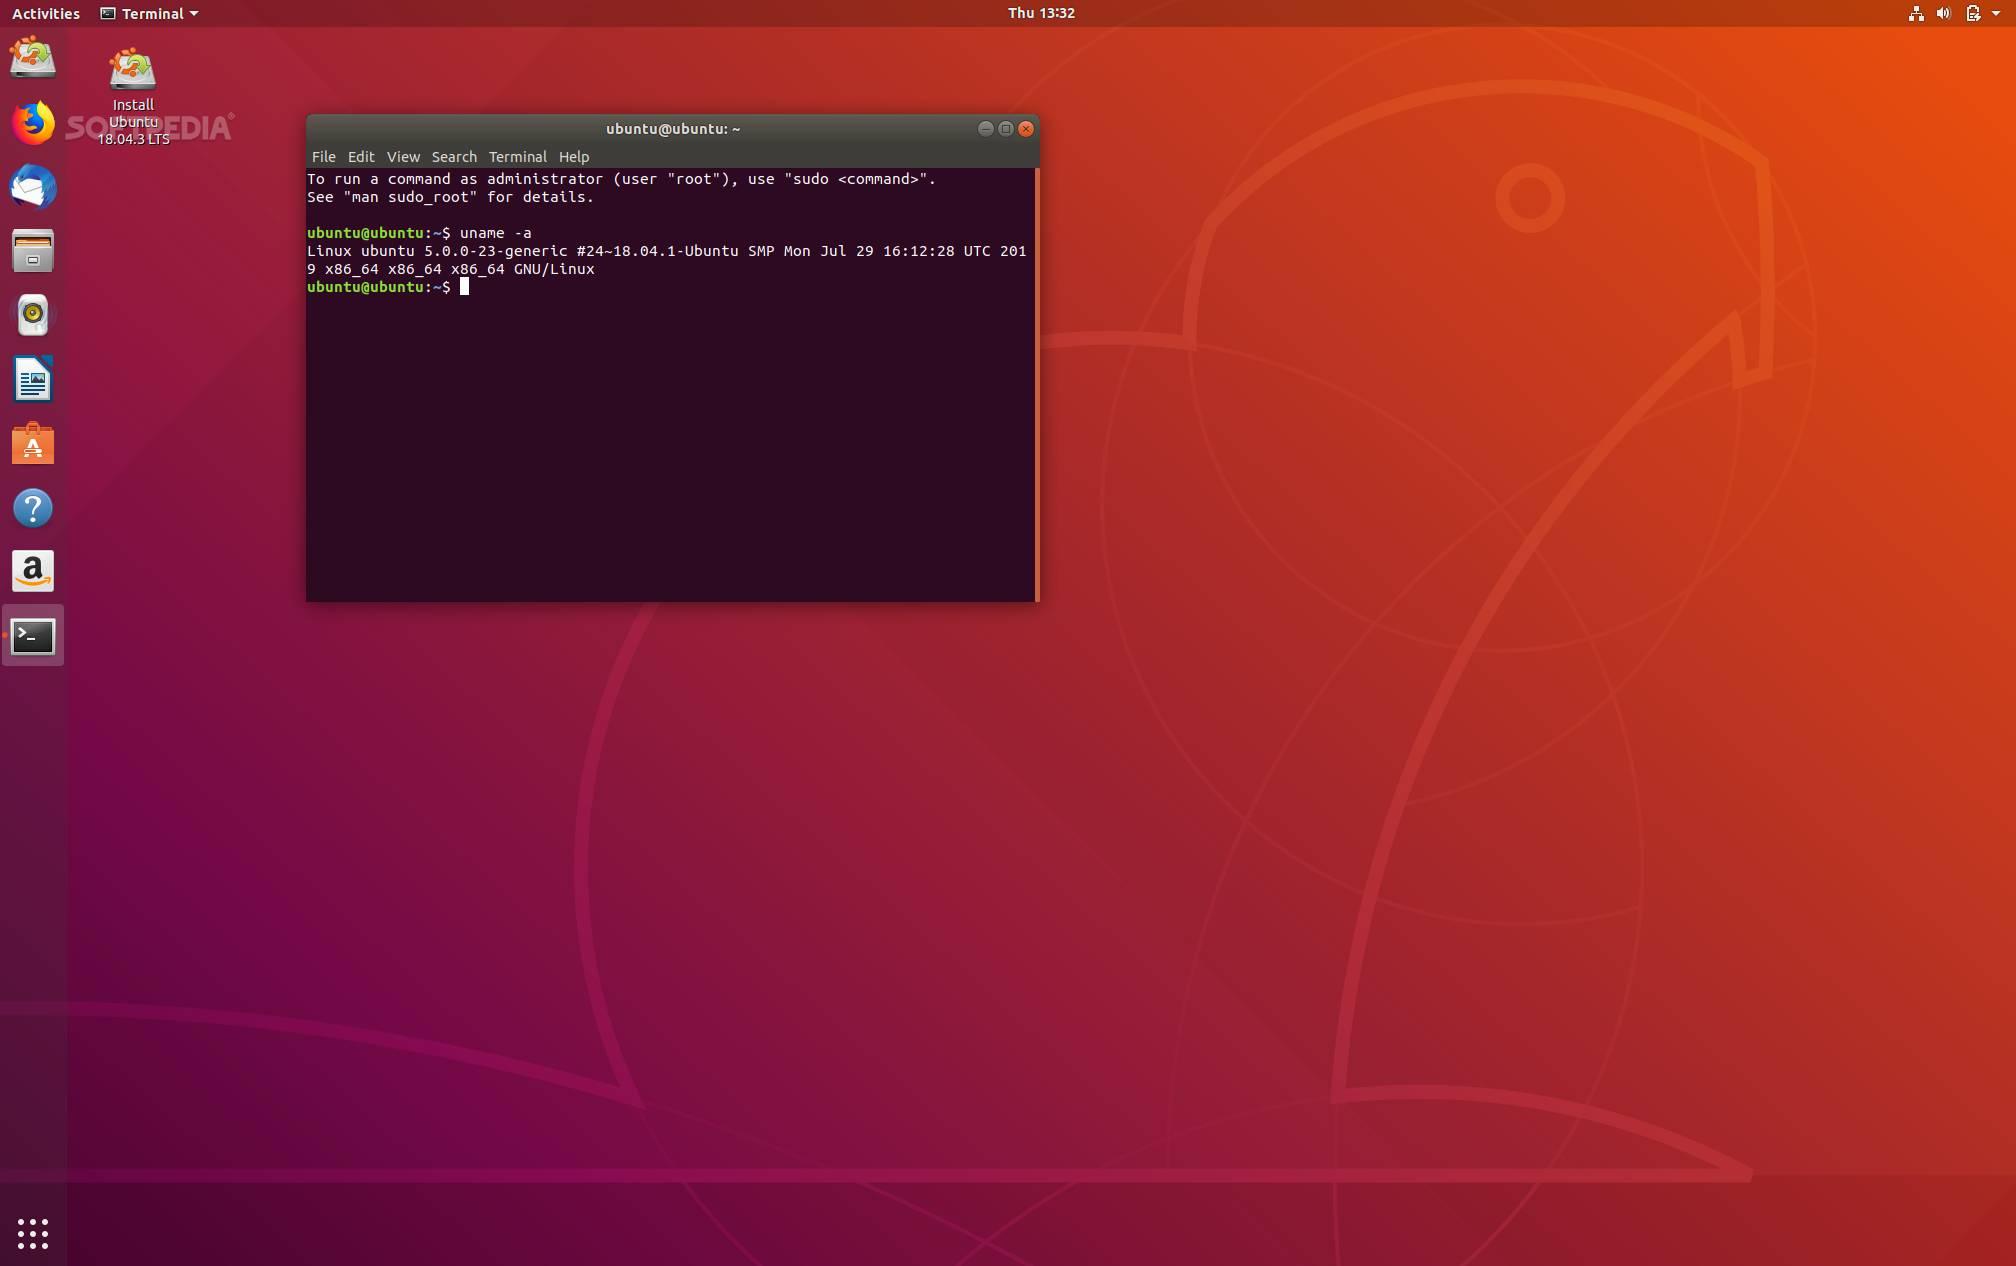 Ubuntu 18.04.3 LTS发布 与19.04一样拥有Linux 5.0内核